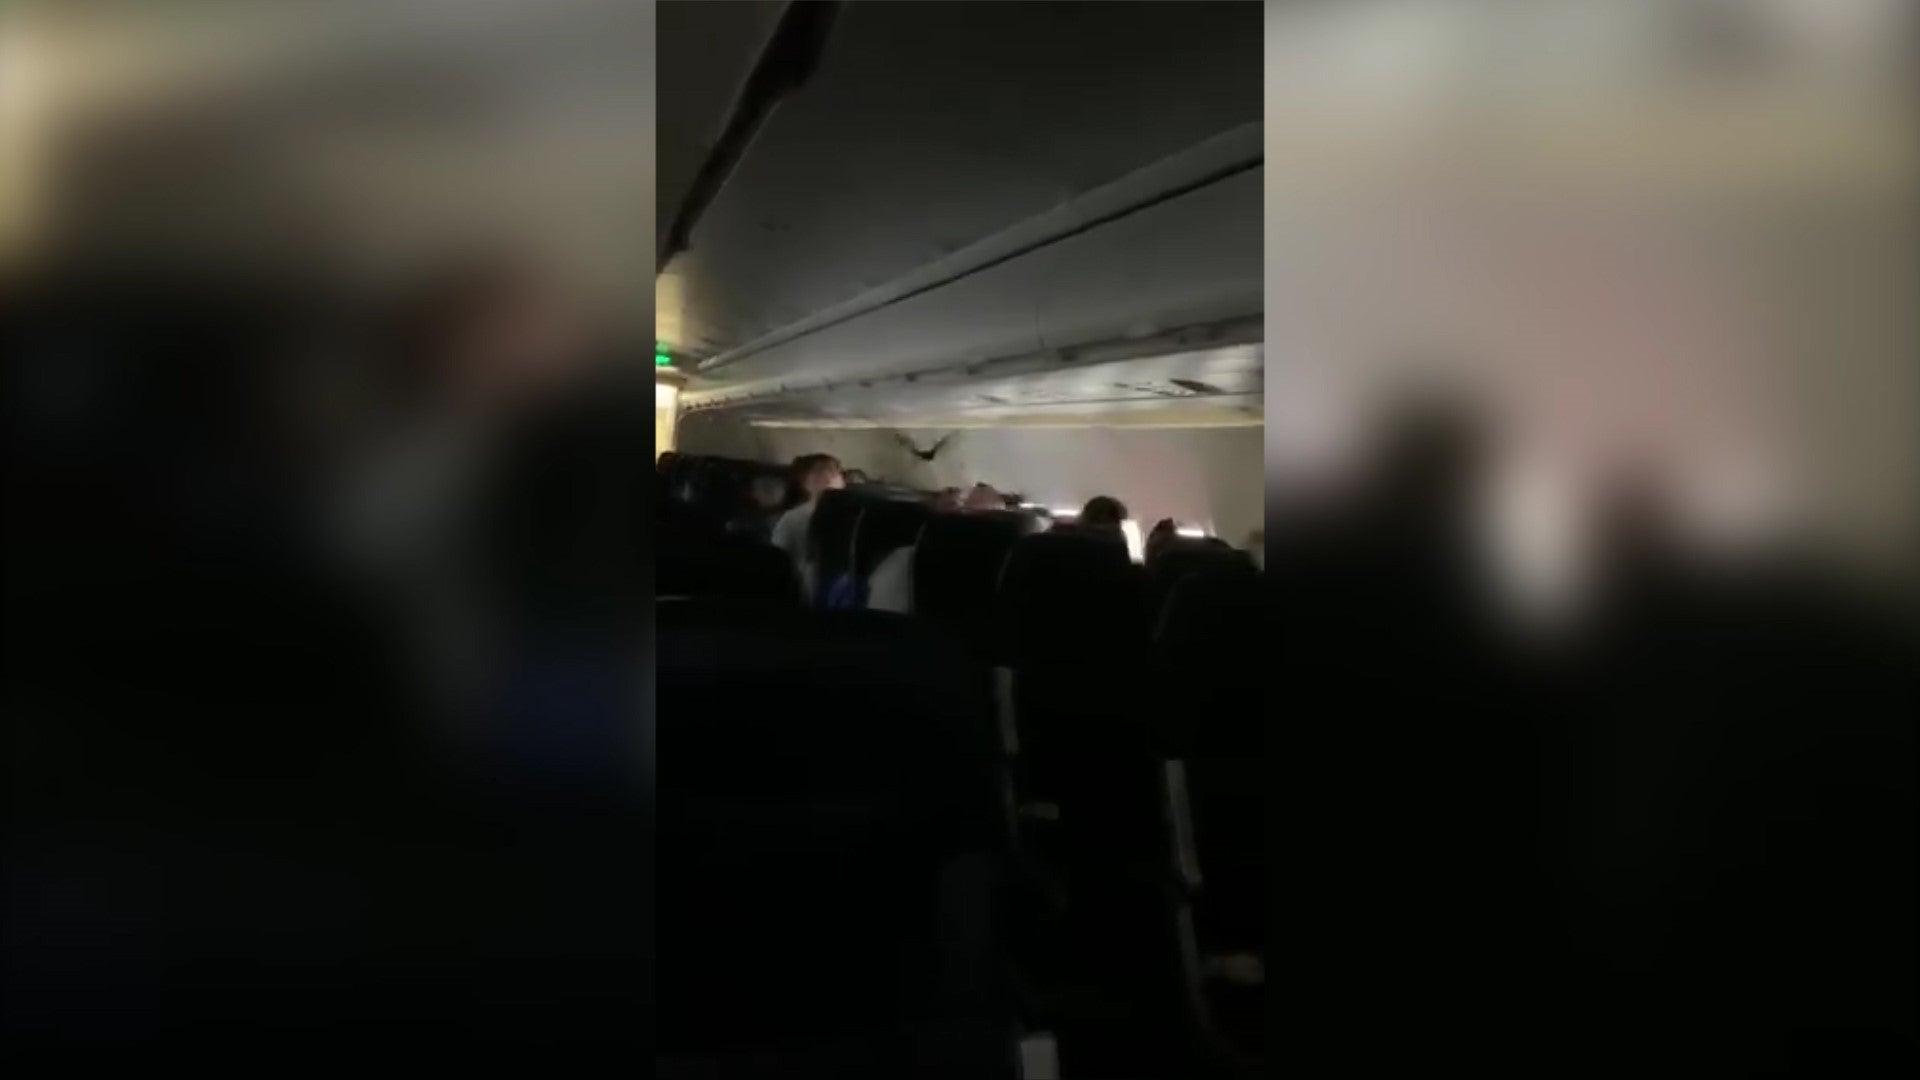 Bat terrifies plane passengers when discovered mid-flight